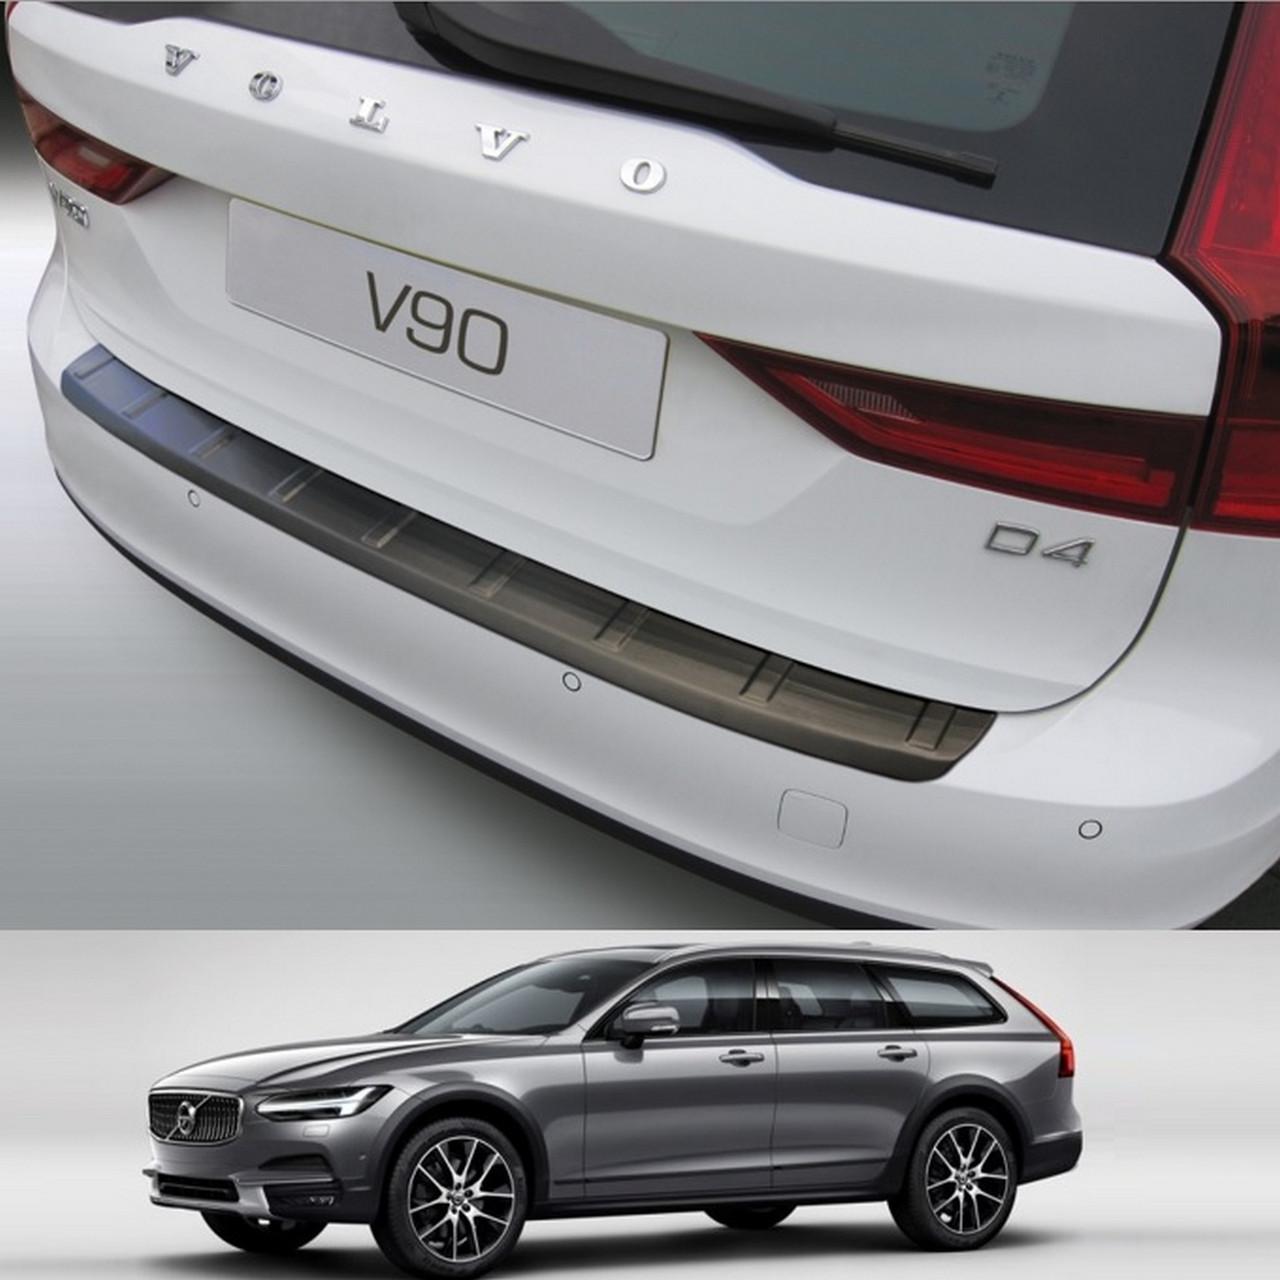 Пластиковая накладка на задний бампер для Volvo V90 9.2016+